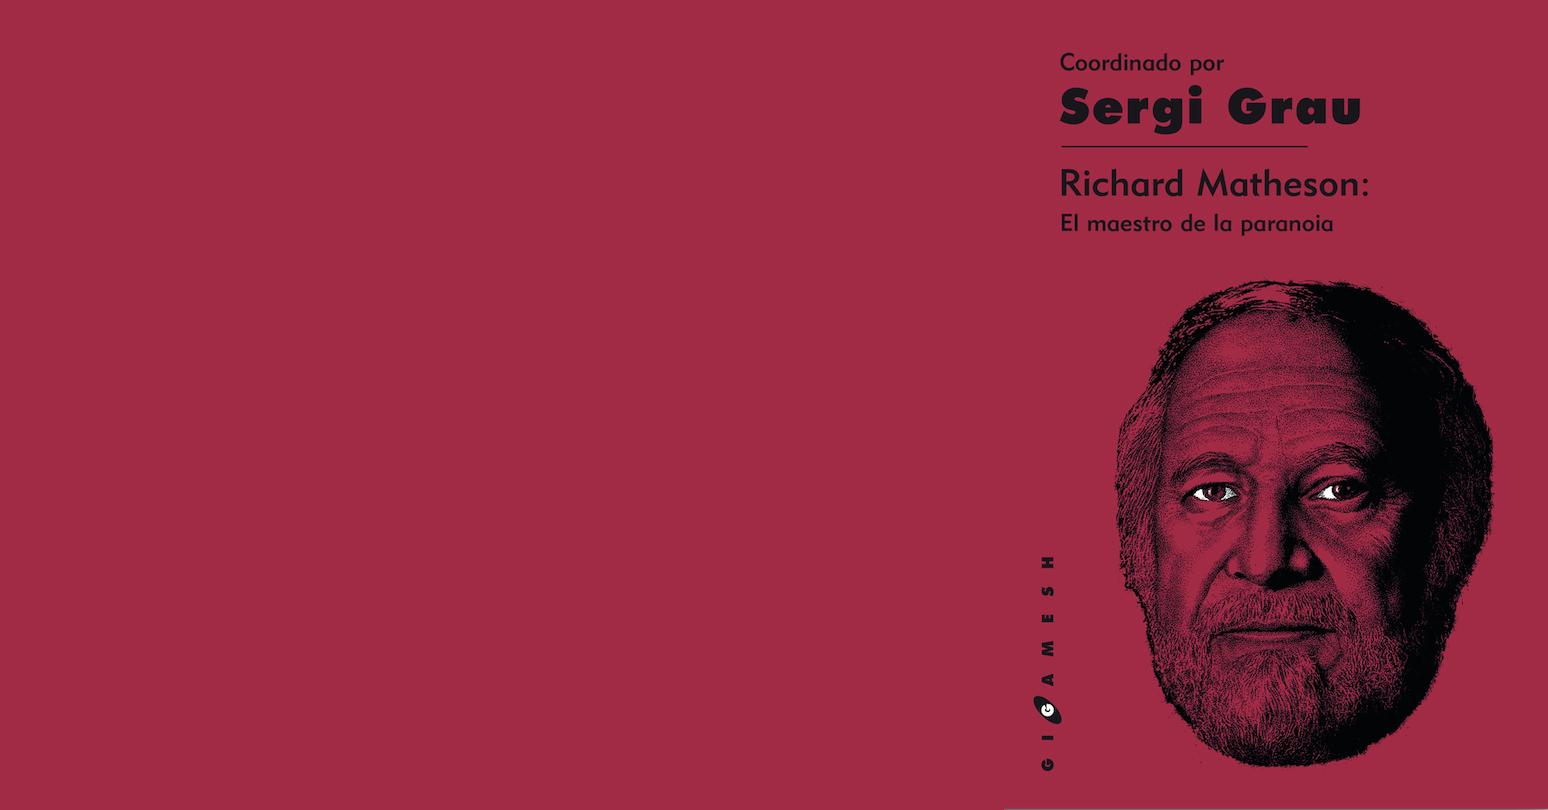 Richard Matheson: El maestro de la paranoia